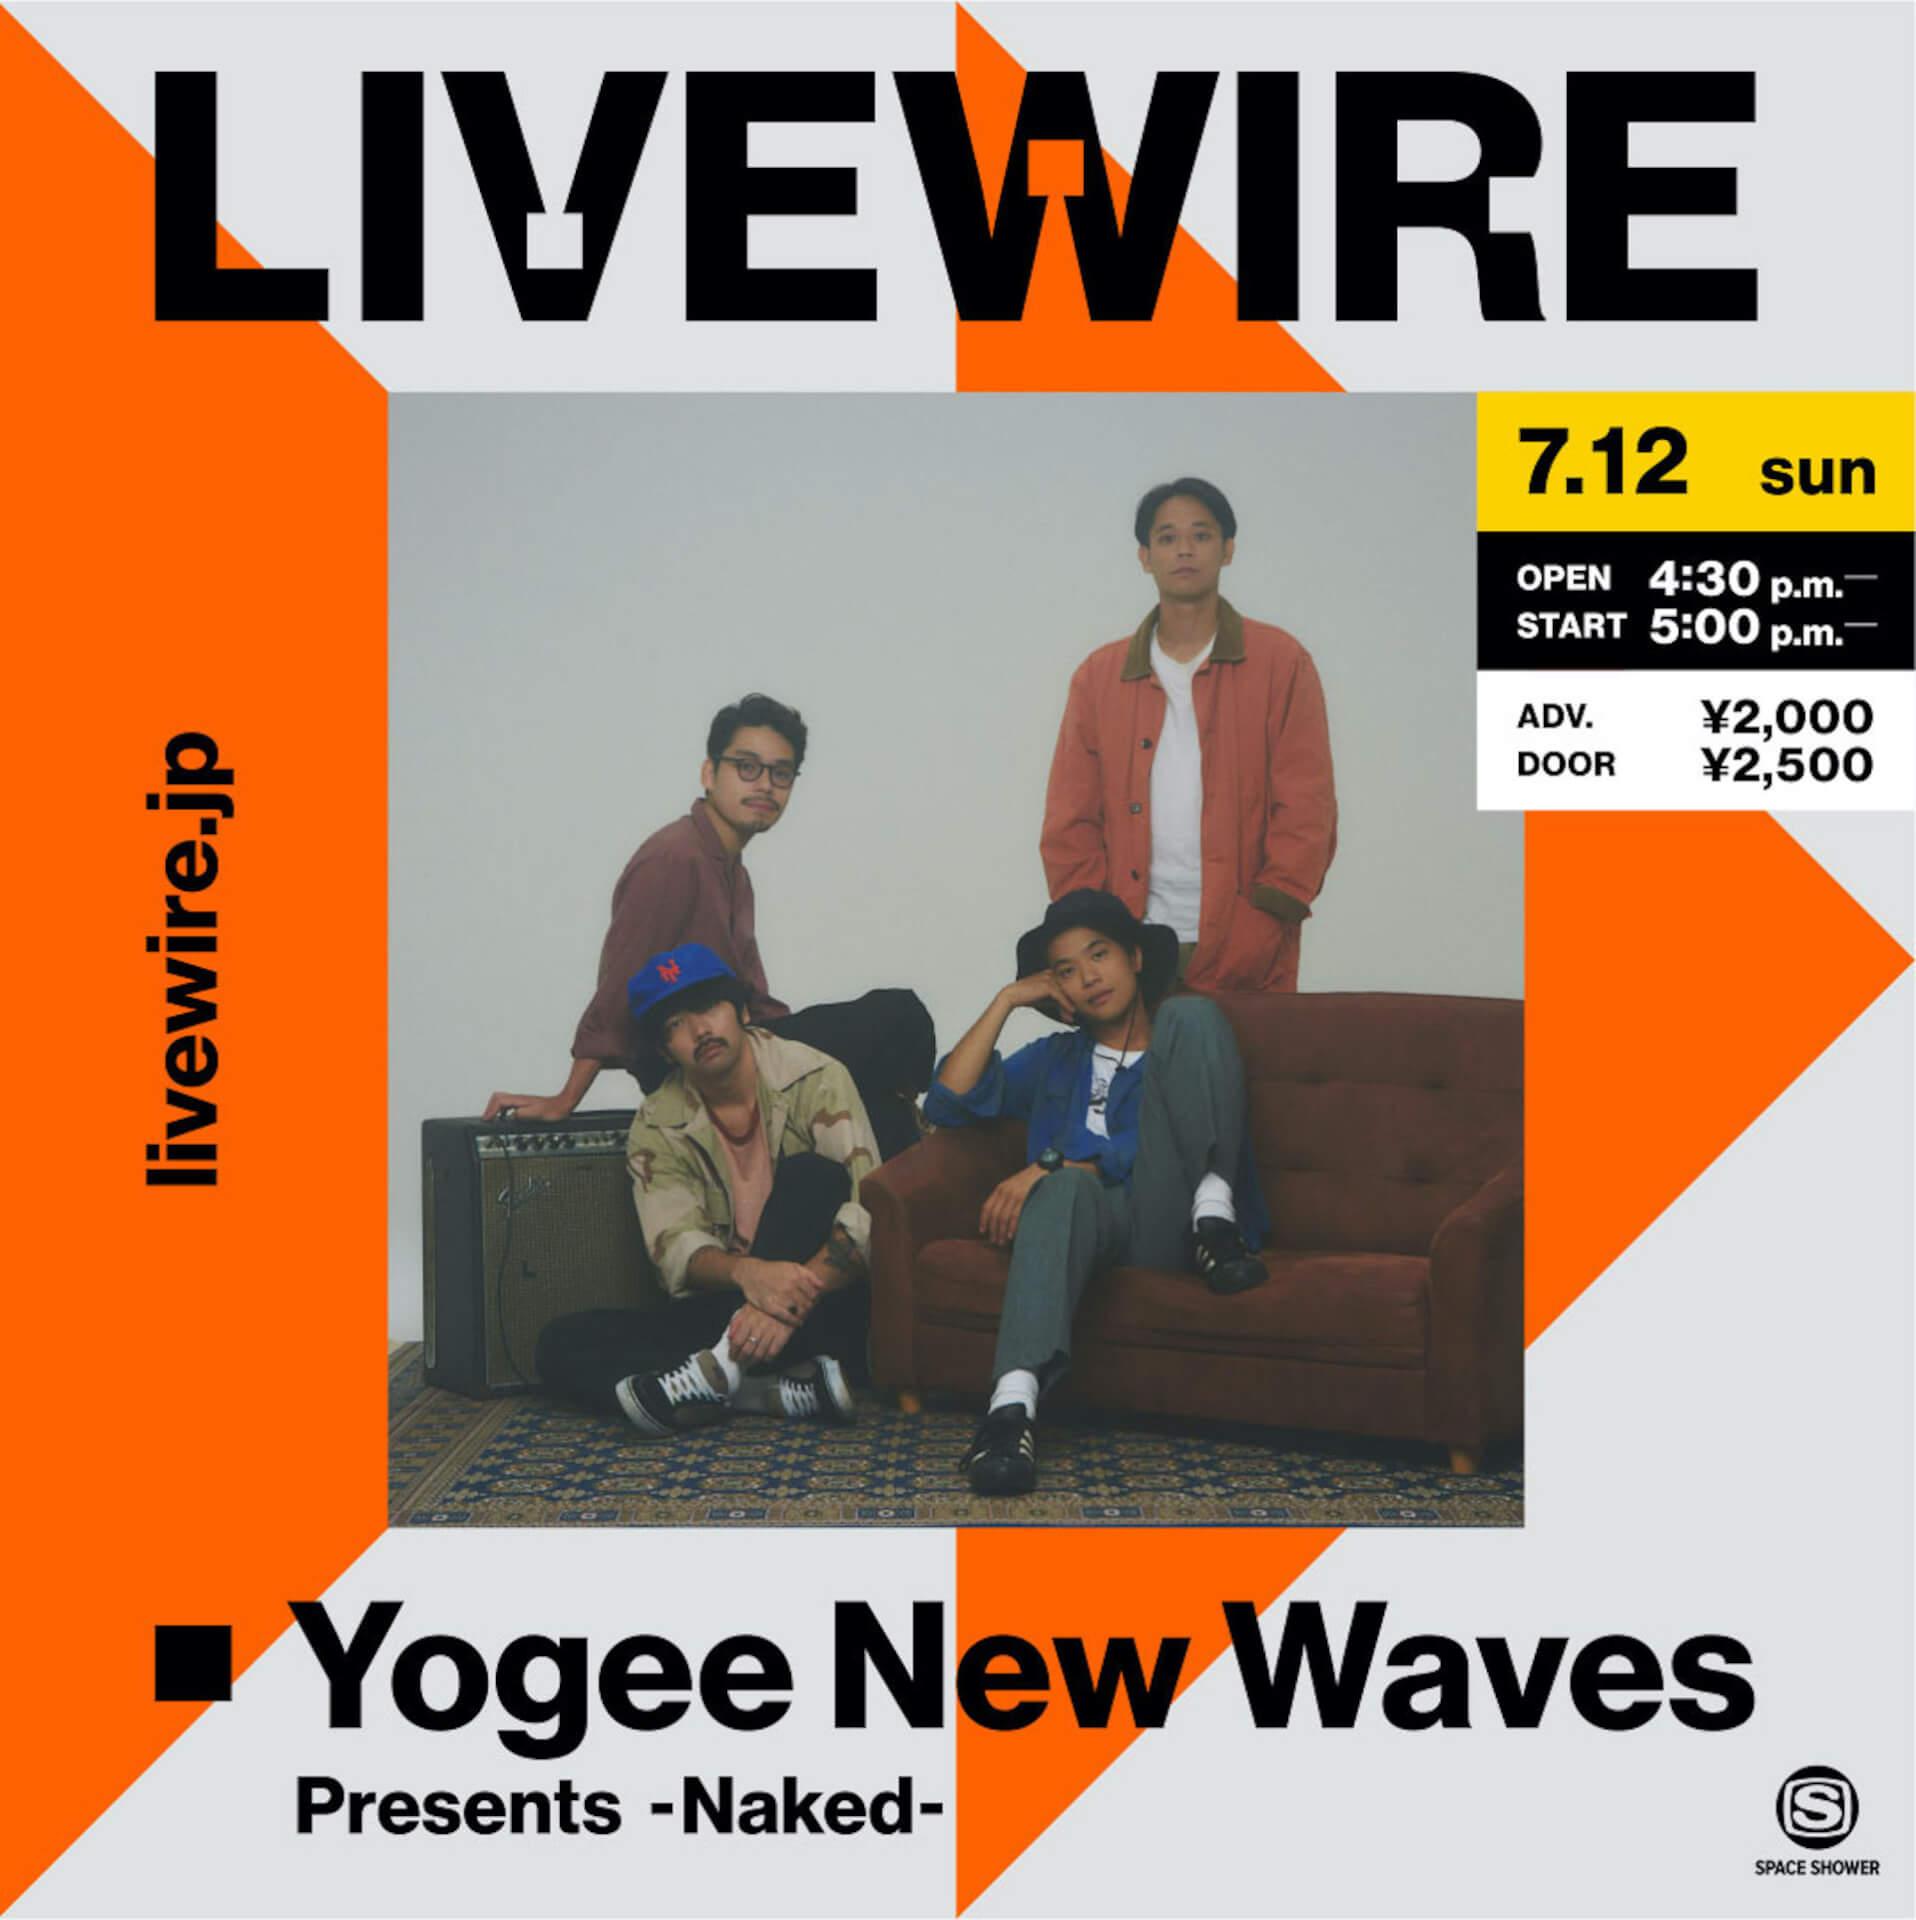 Yogee New Waves初となる3部構成の配信ライブが開催決定!「LIVEWIRE」オープニングシリーズ追加公演 music200703_livewire_yogeenewwaves_01